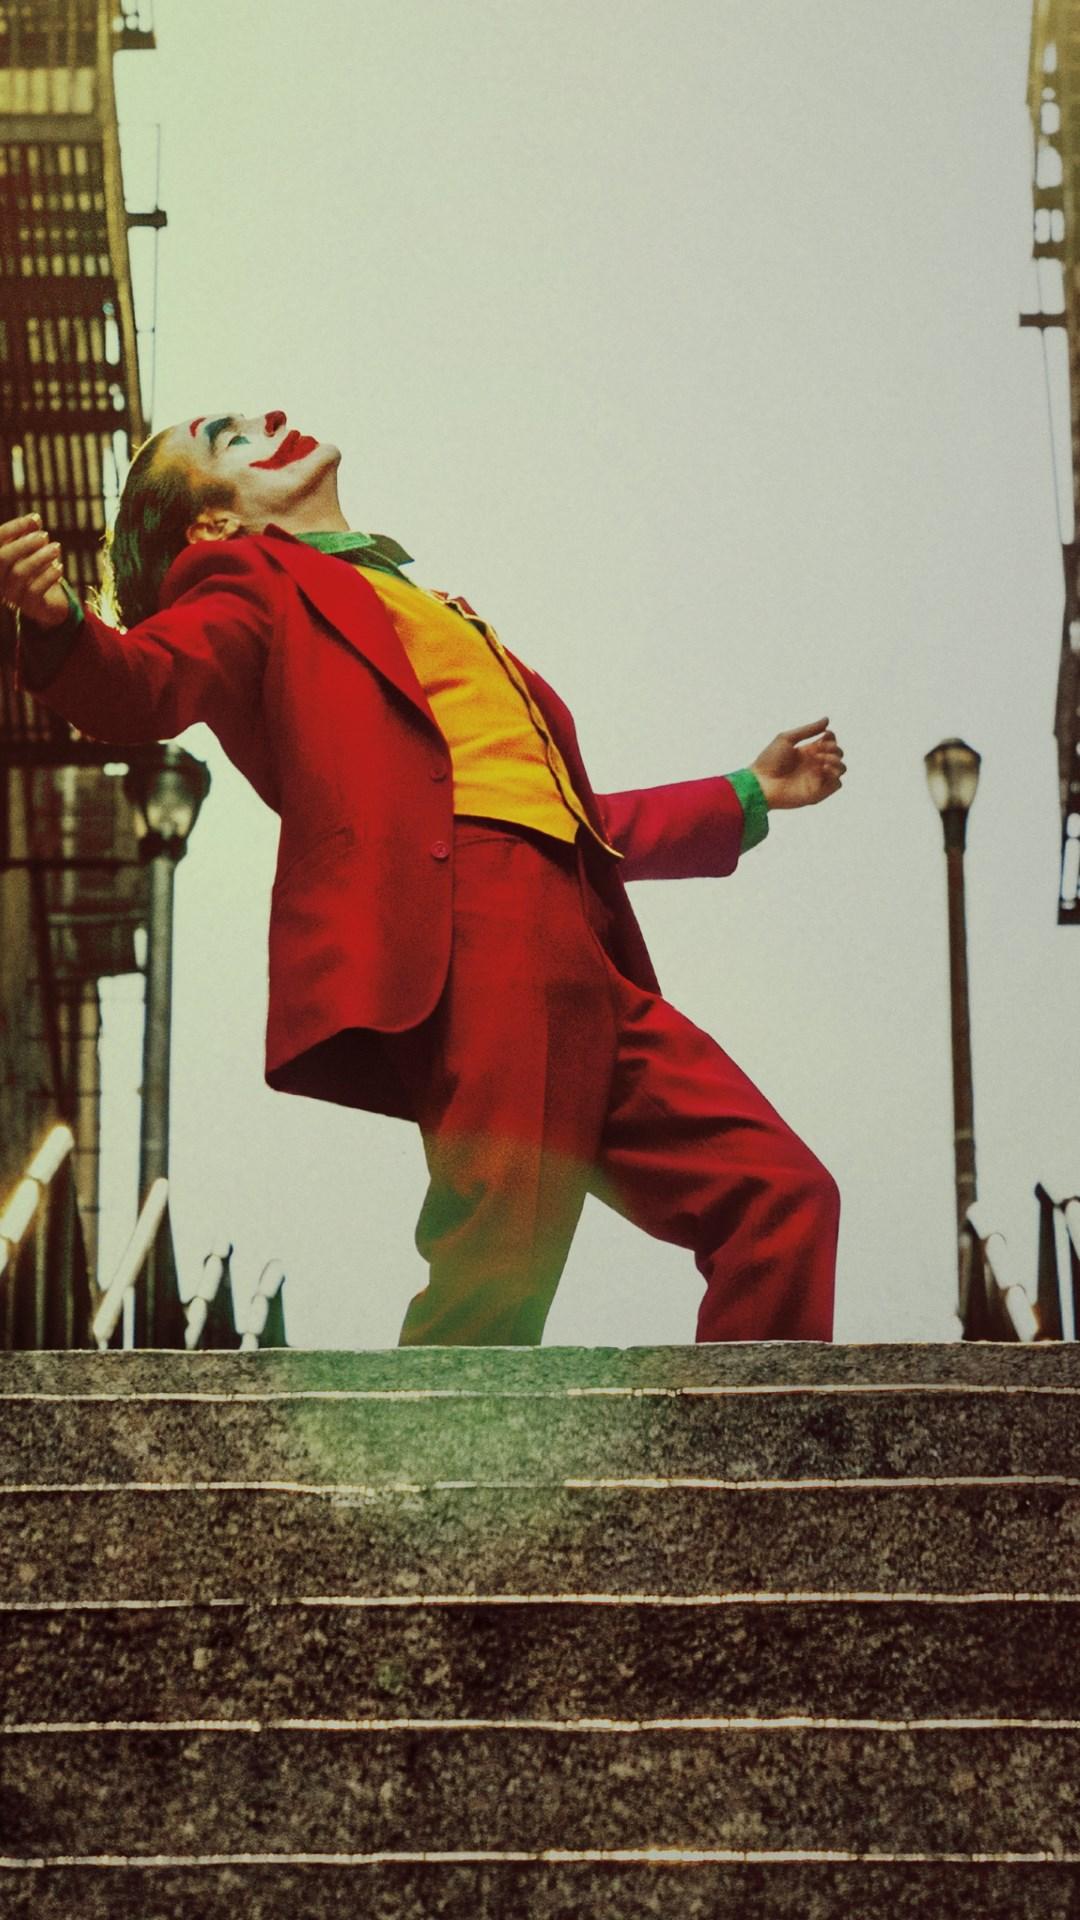 Download Wallpaper Joker 1080x1920